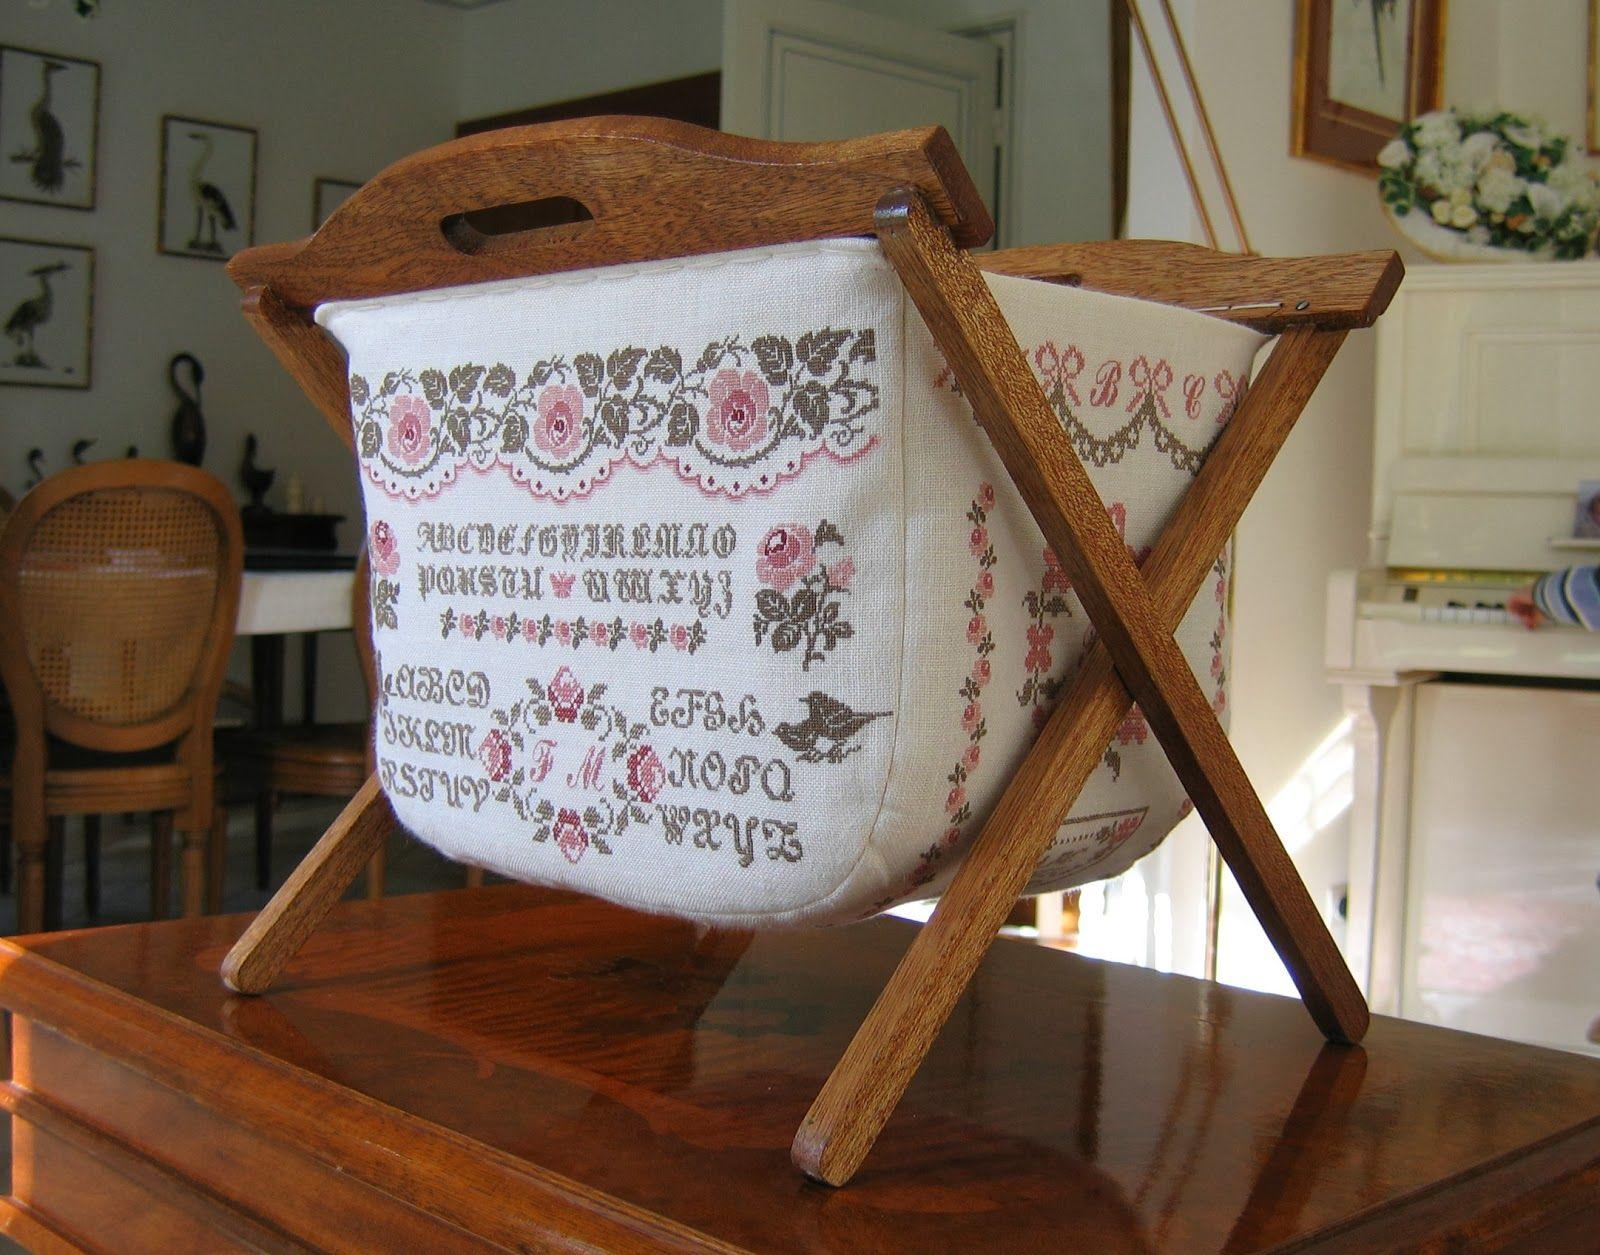 beautiful sewing basket bastelideen pinterest f r zu. Black Bedroom Furniture Sets. Home Design Ideas